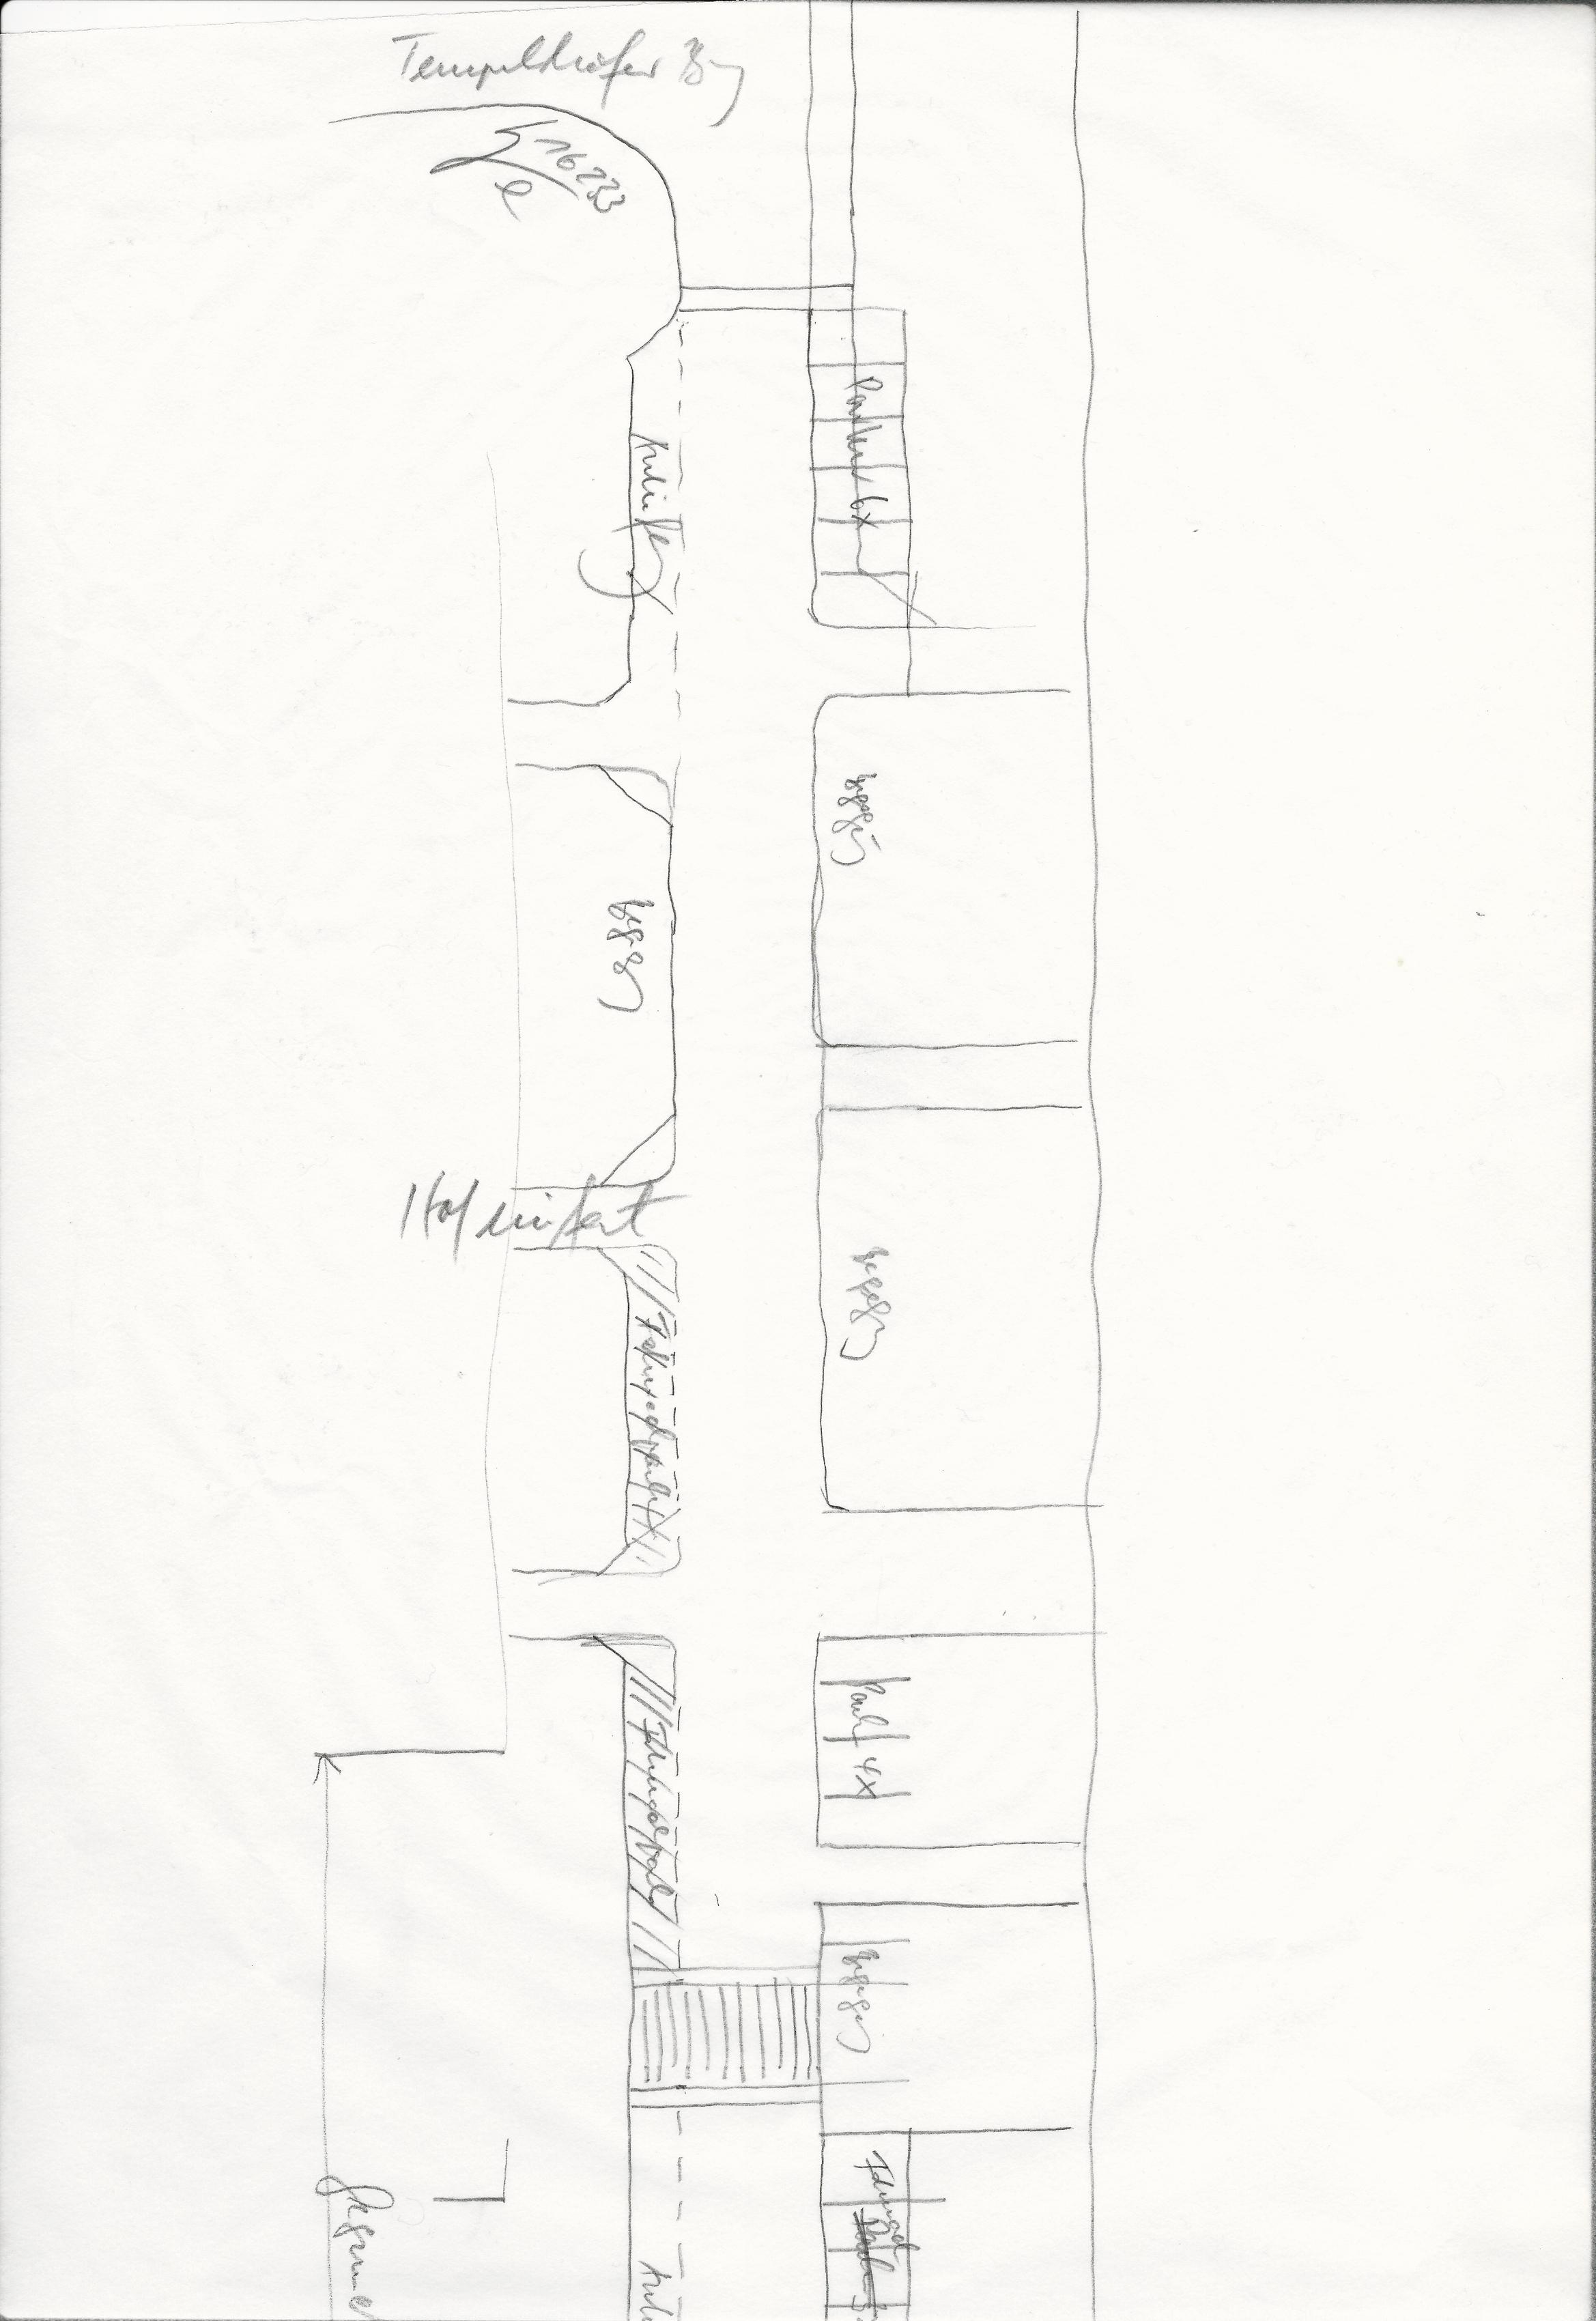 BegegnungBergmann 16234 - ARARAT Skizze 1.v6